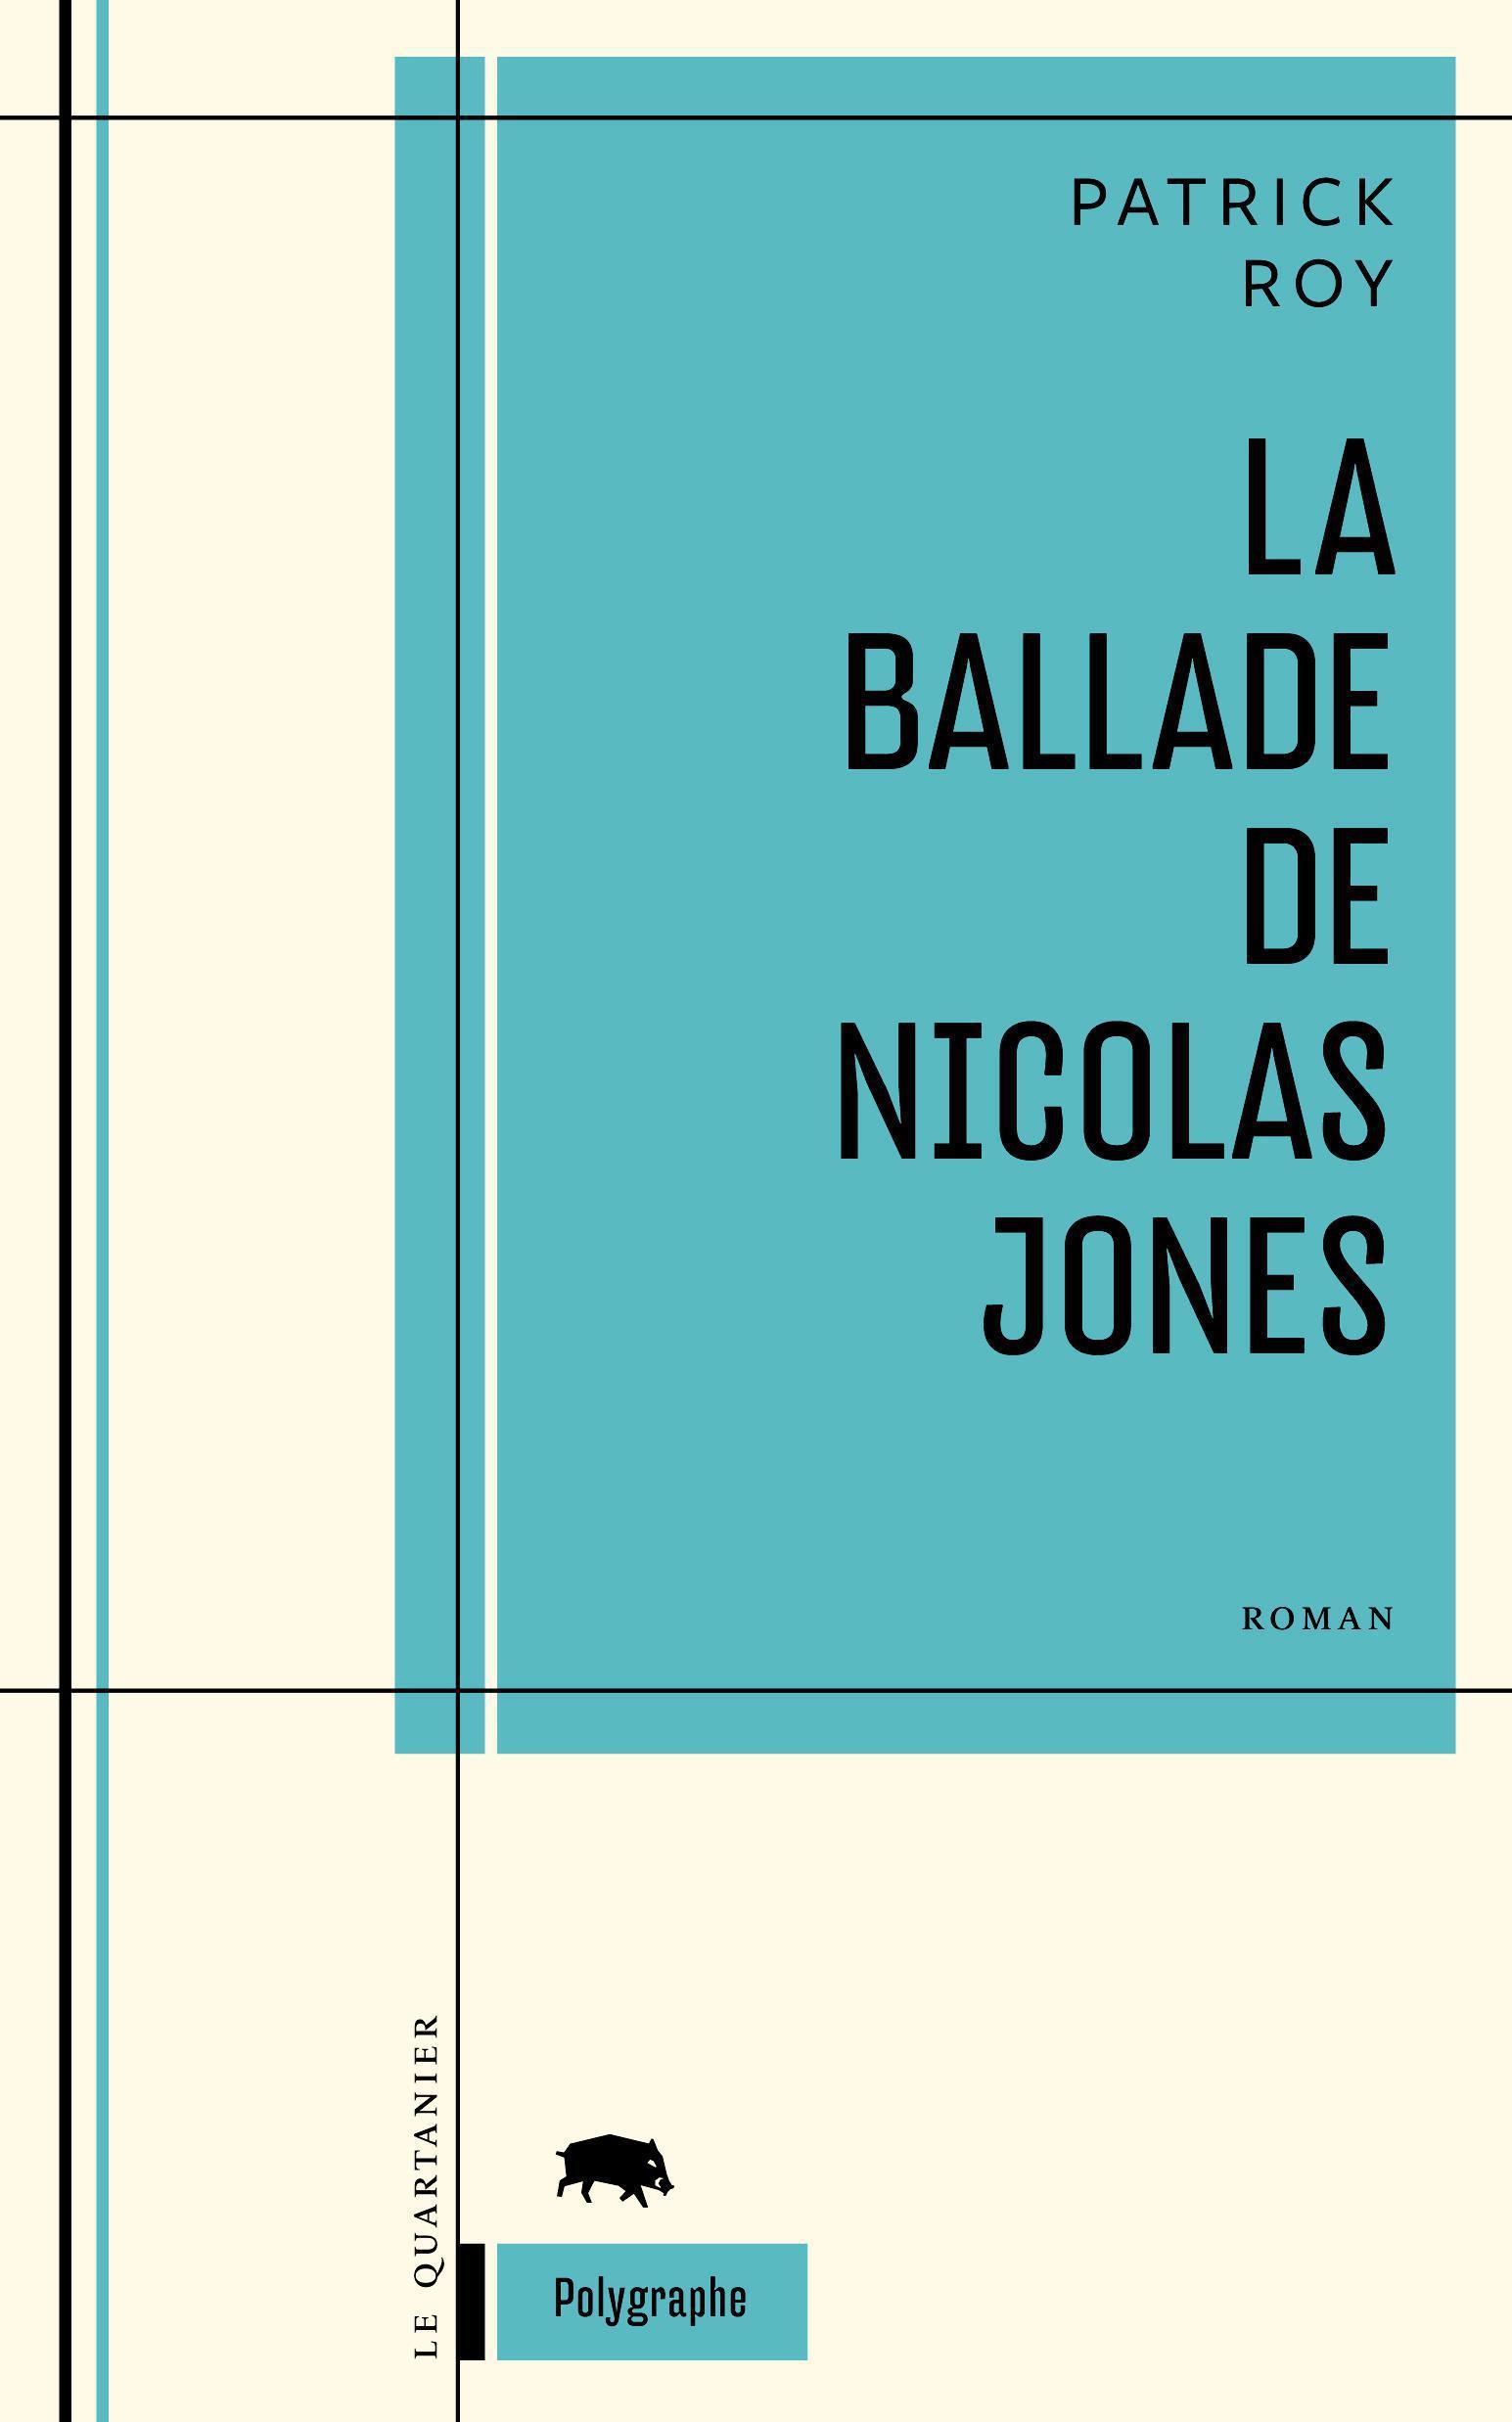 La ballade de Nicolas Jones